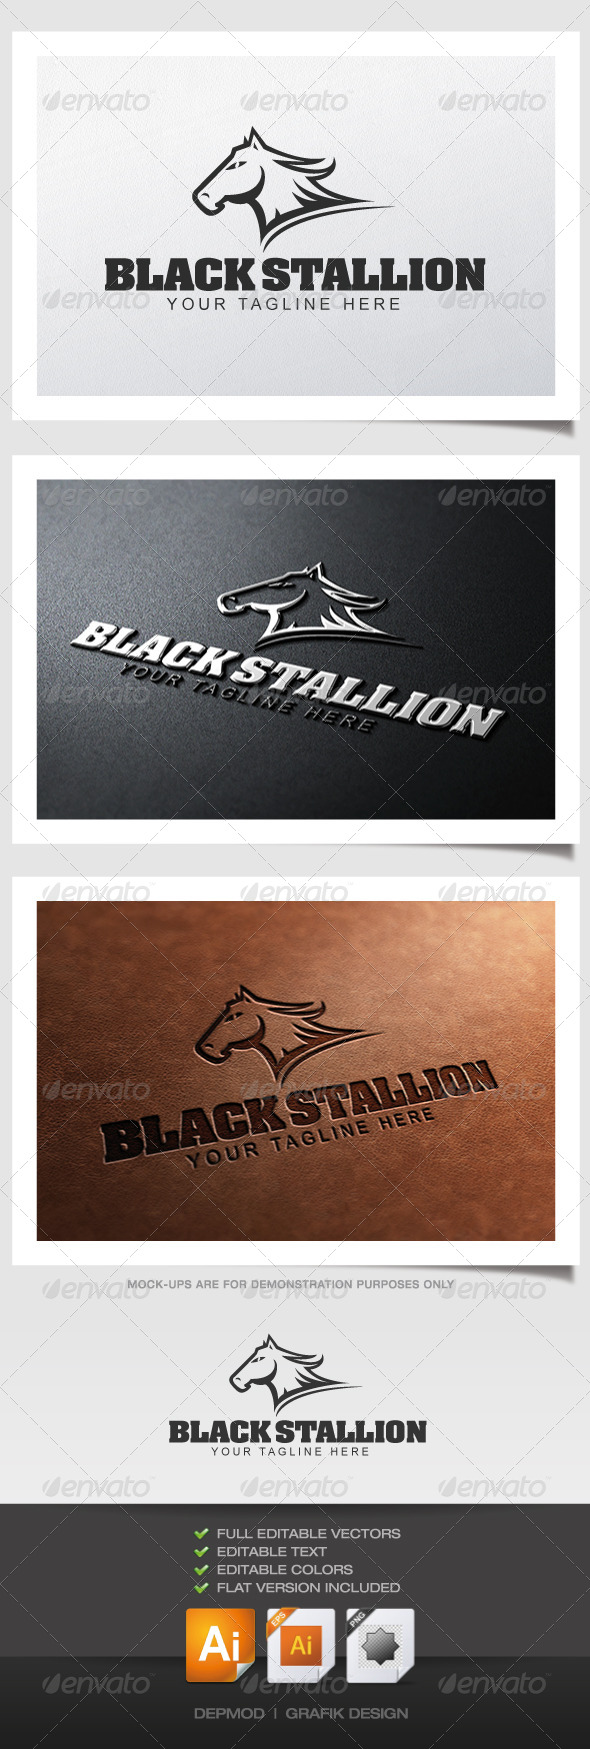 GraphicRiver Black Stallion Logo 4407273